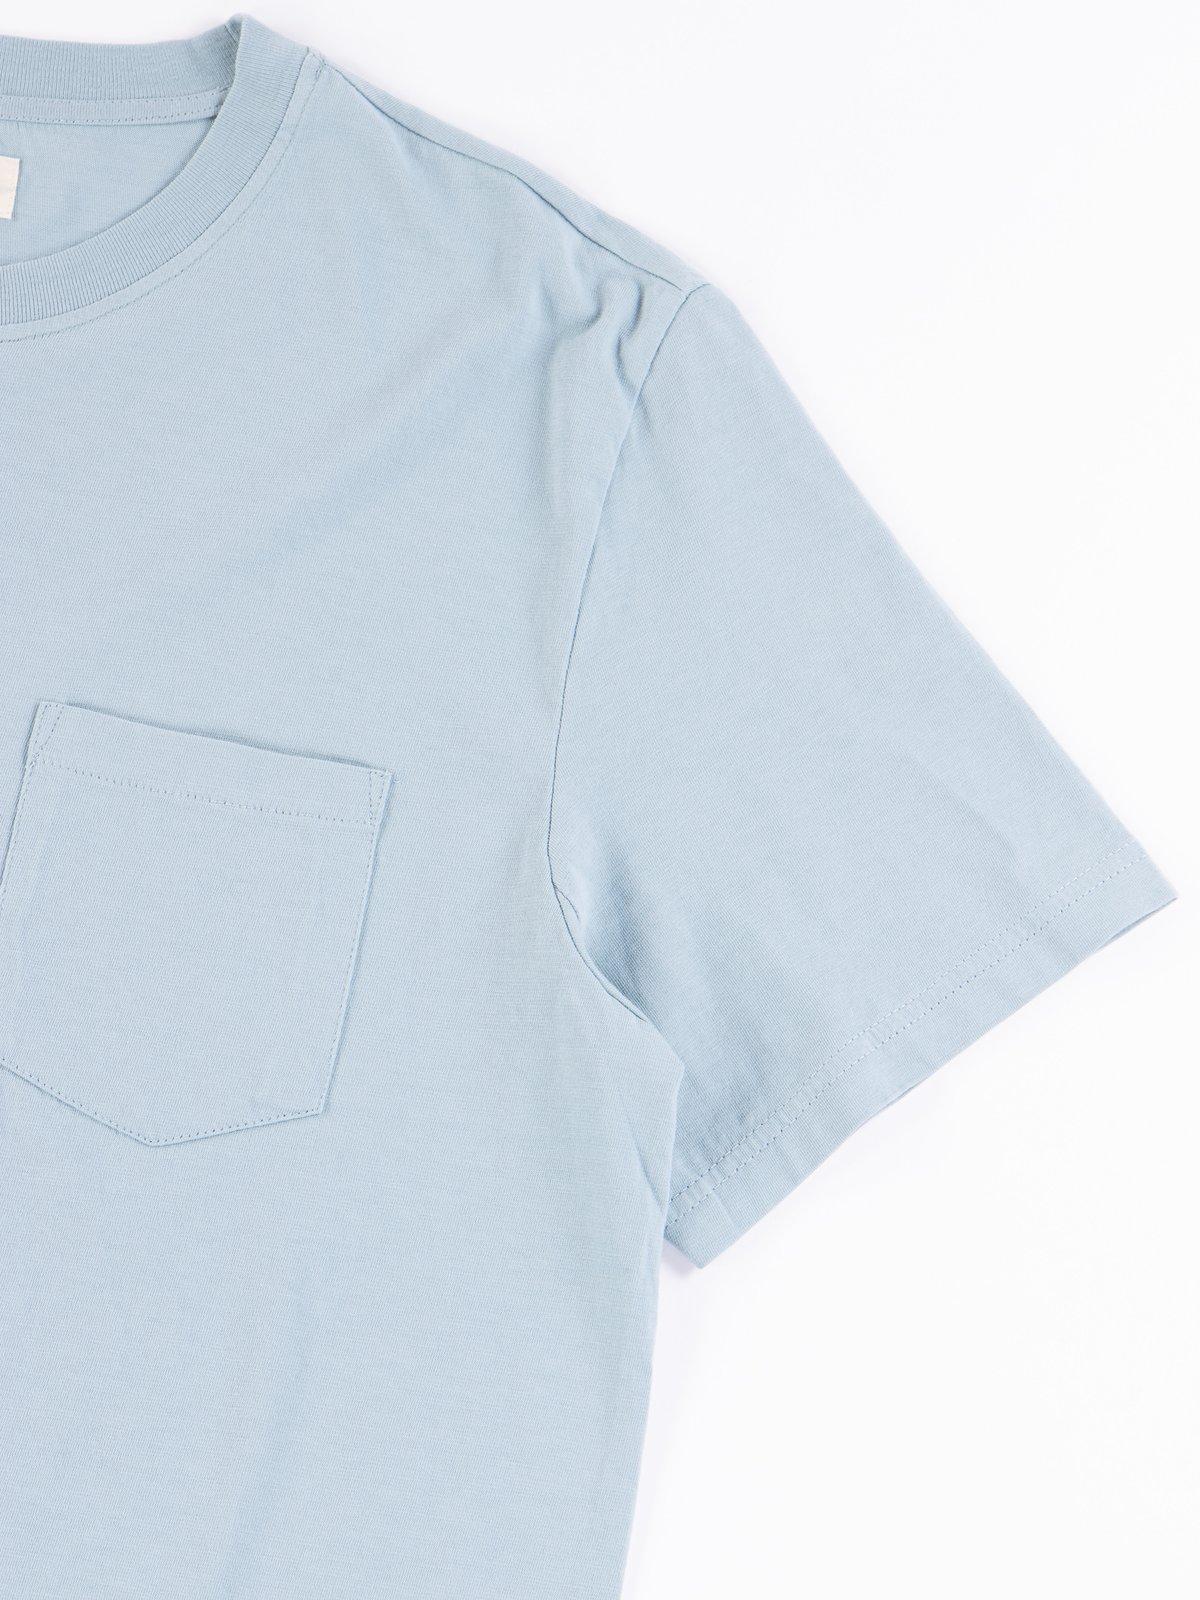 Pale Blue Good Basics CTP01 Pocket Crew Neck Tee - Image 4